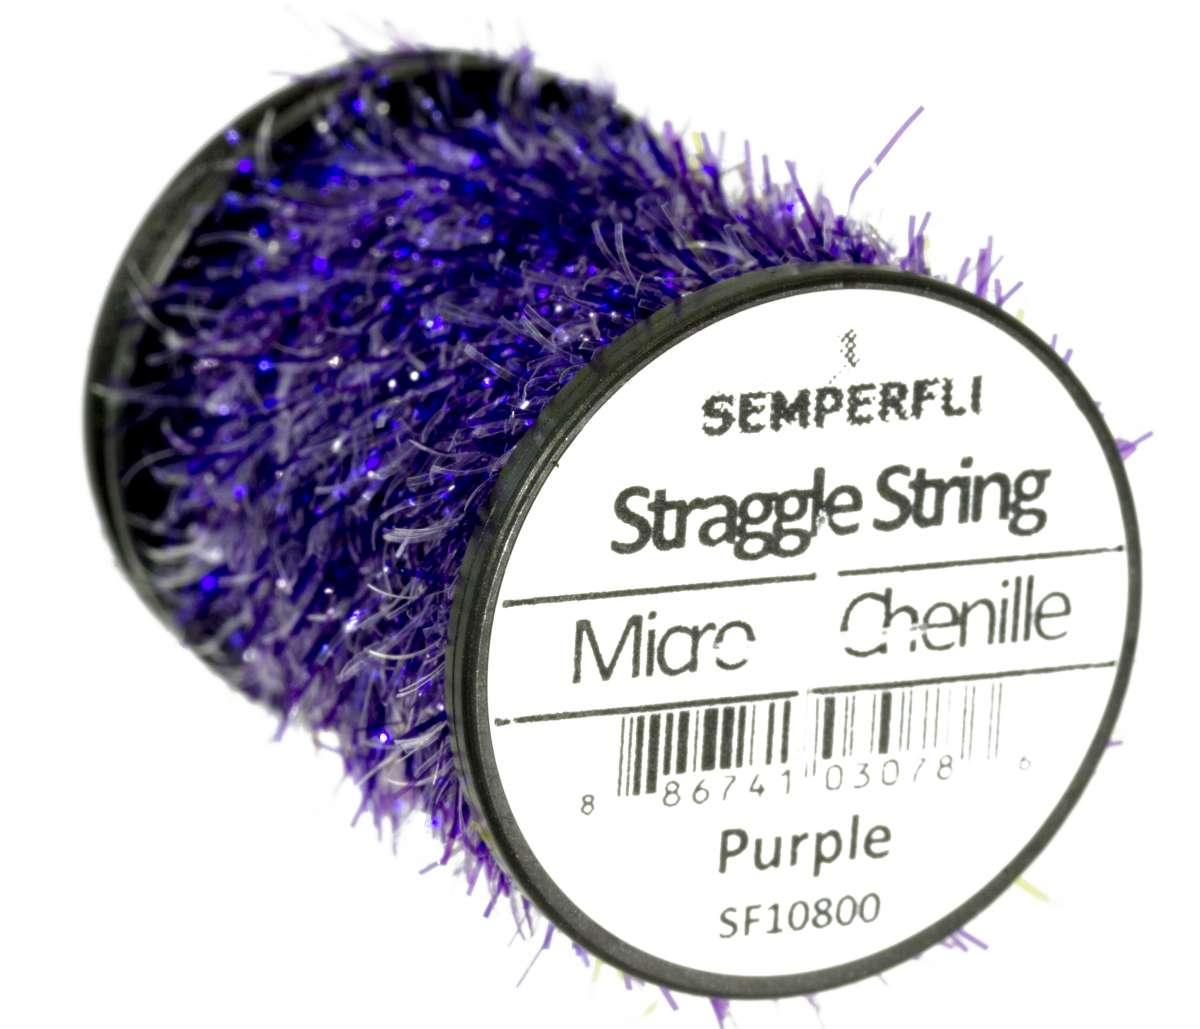 Straggle String ss-sf10800 Purple